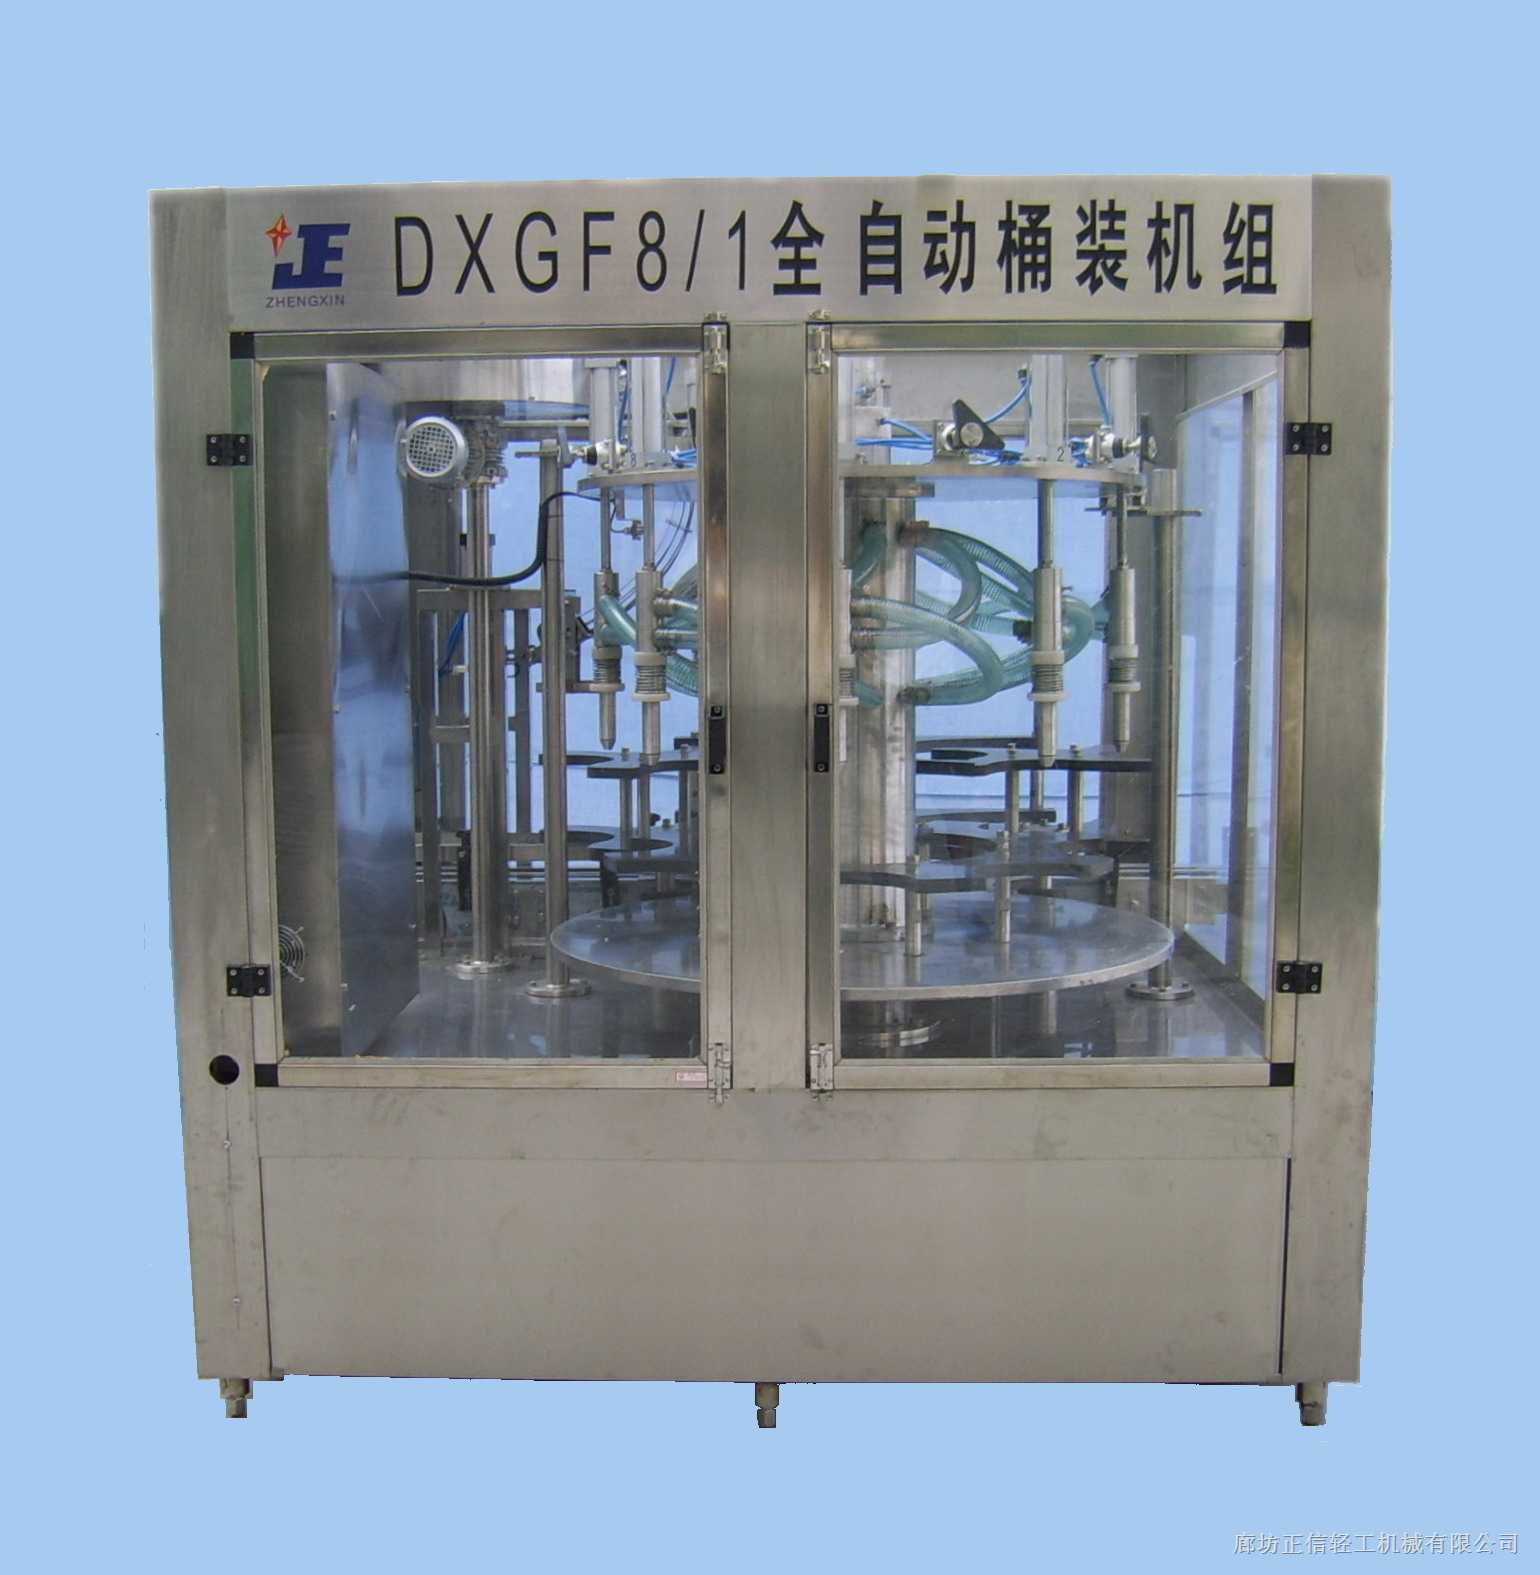 dxgf-8-桶装水灌装机-廊坊市蓝晨机械设备有限公司